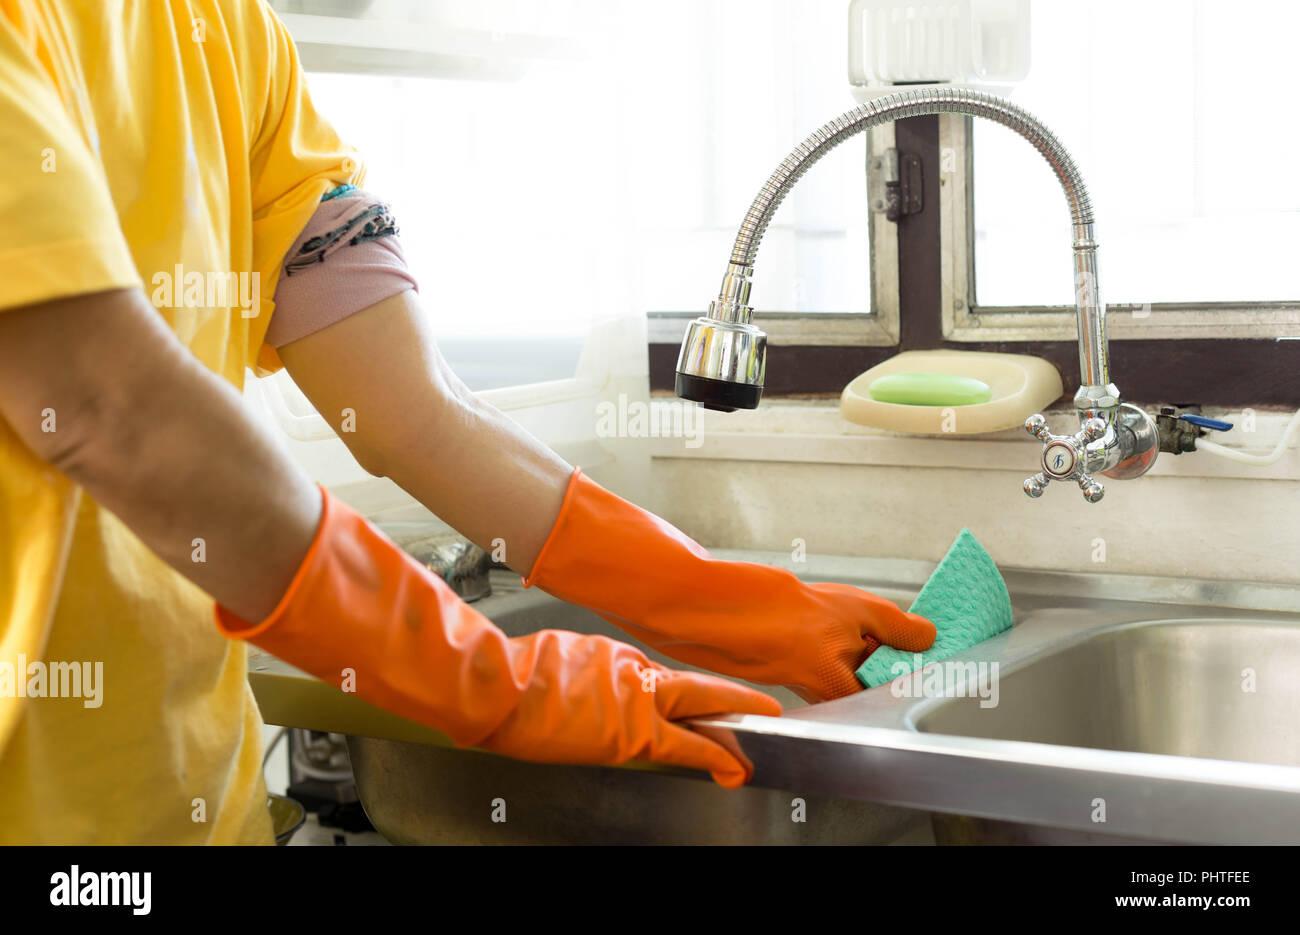 https www alamy com hand with orange glove cleaning kitchen sink image217512582 html